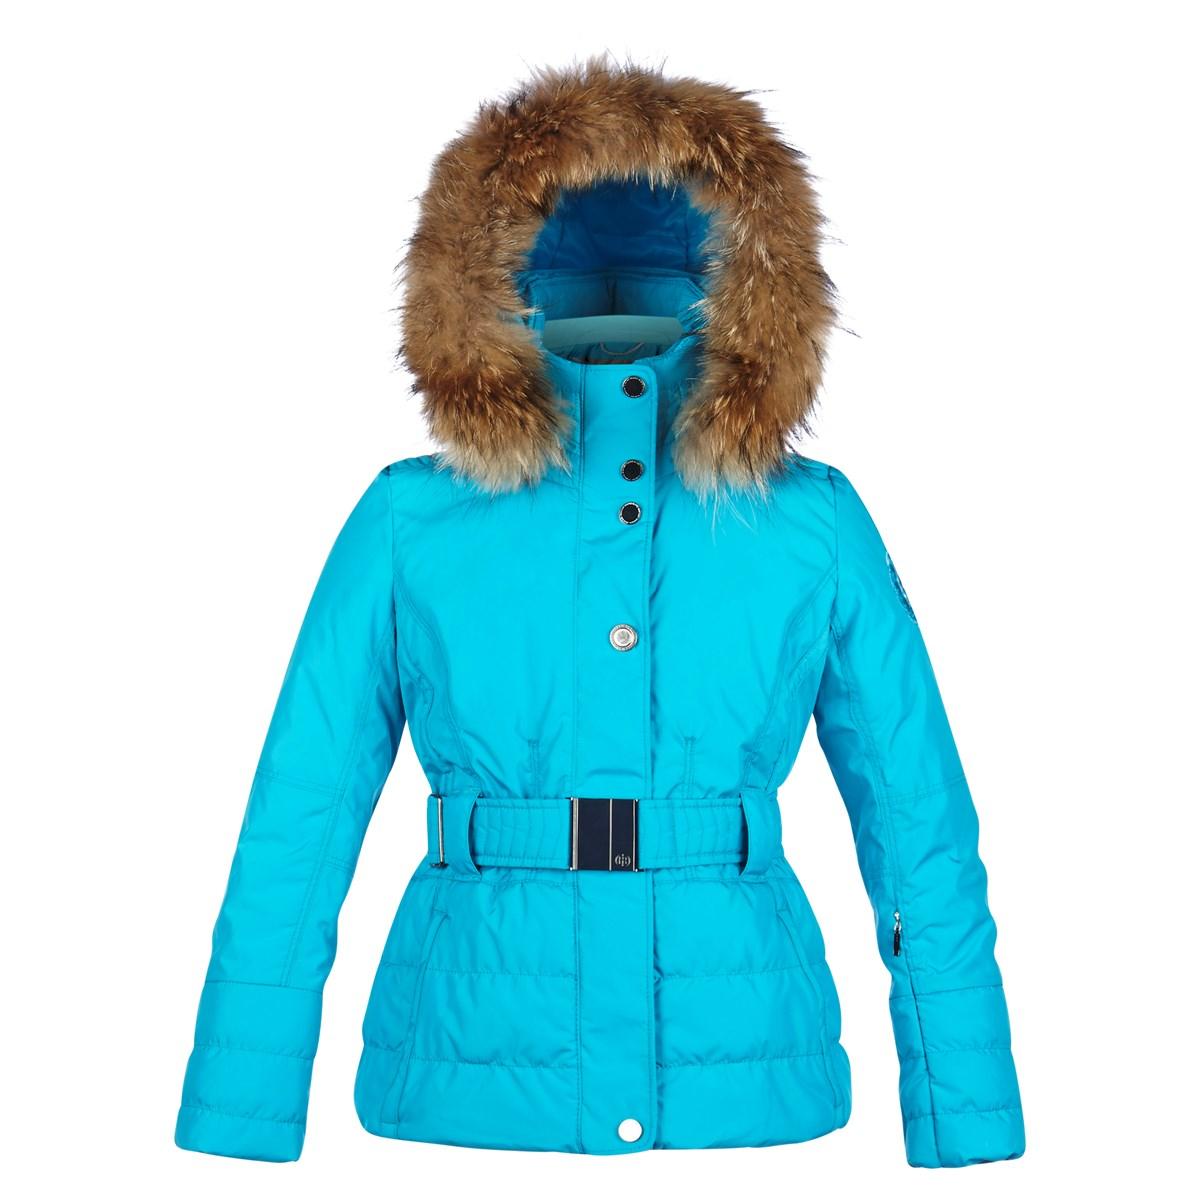 66c636e9b Poivre Blanc Alice Girls Ski Jacket in Blue Lagoon £185.00